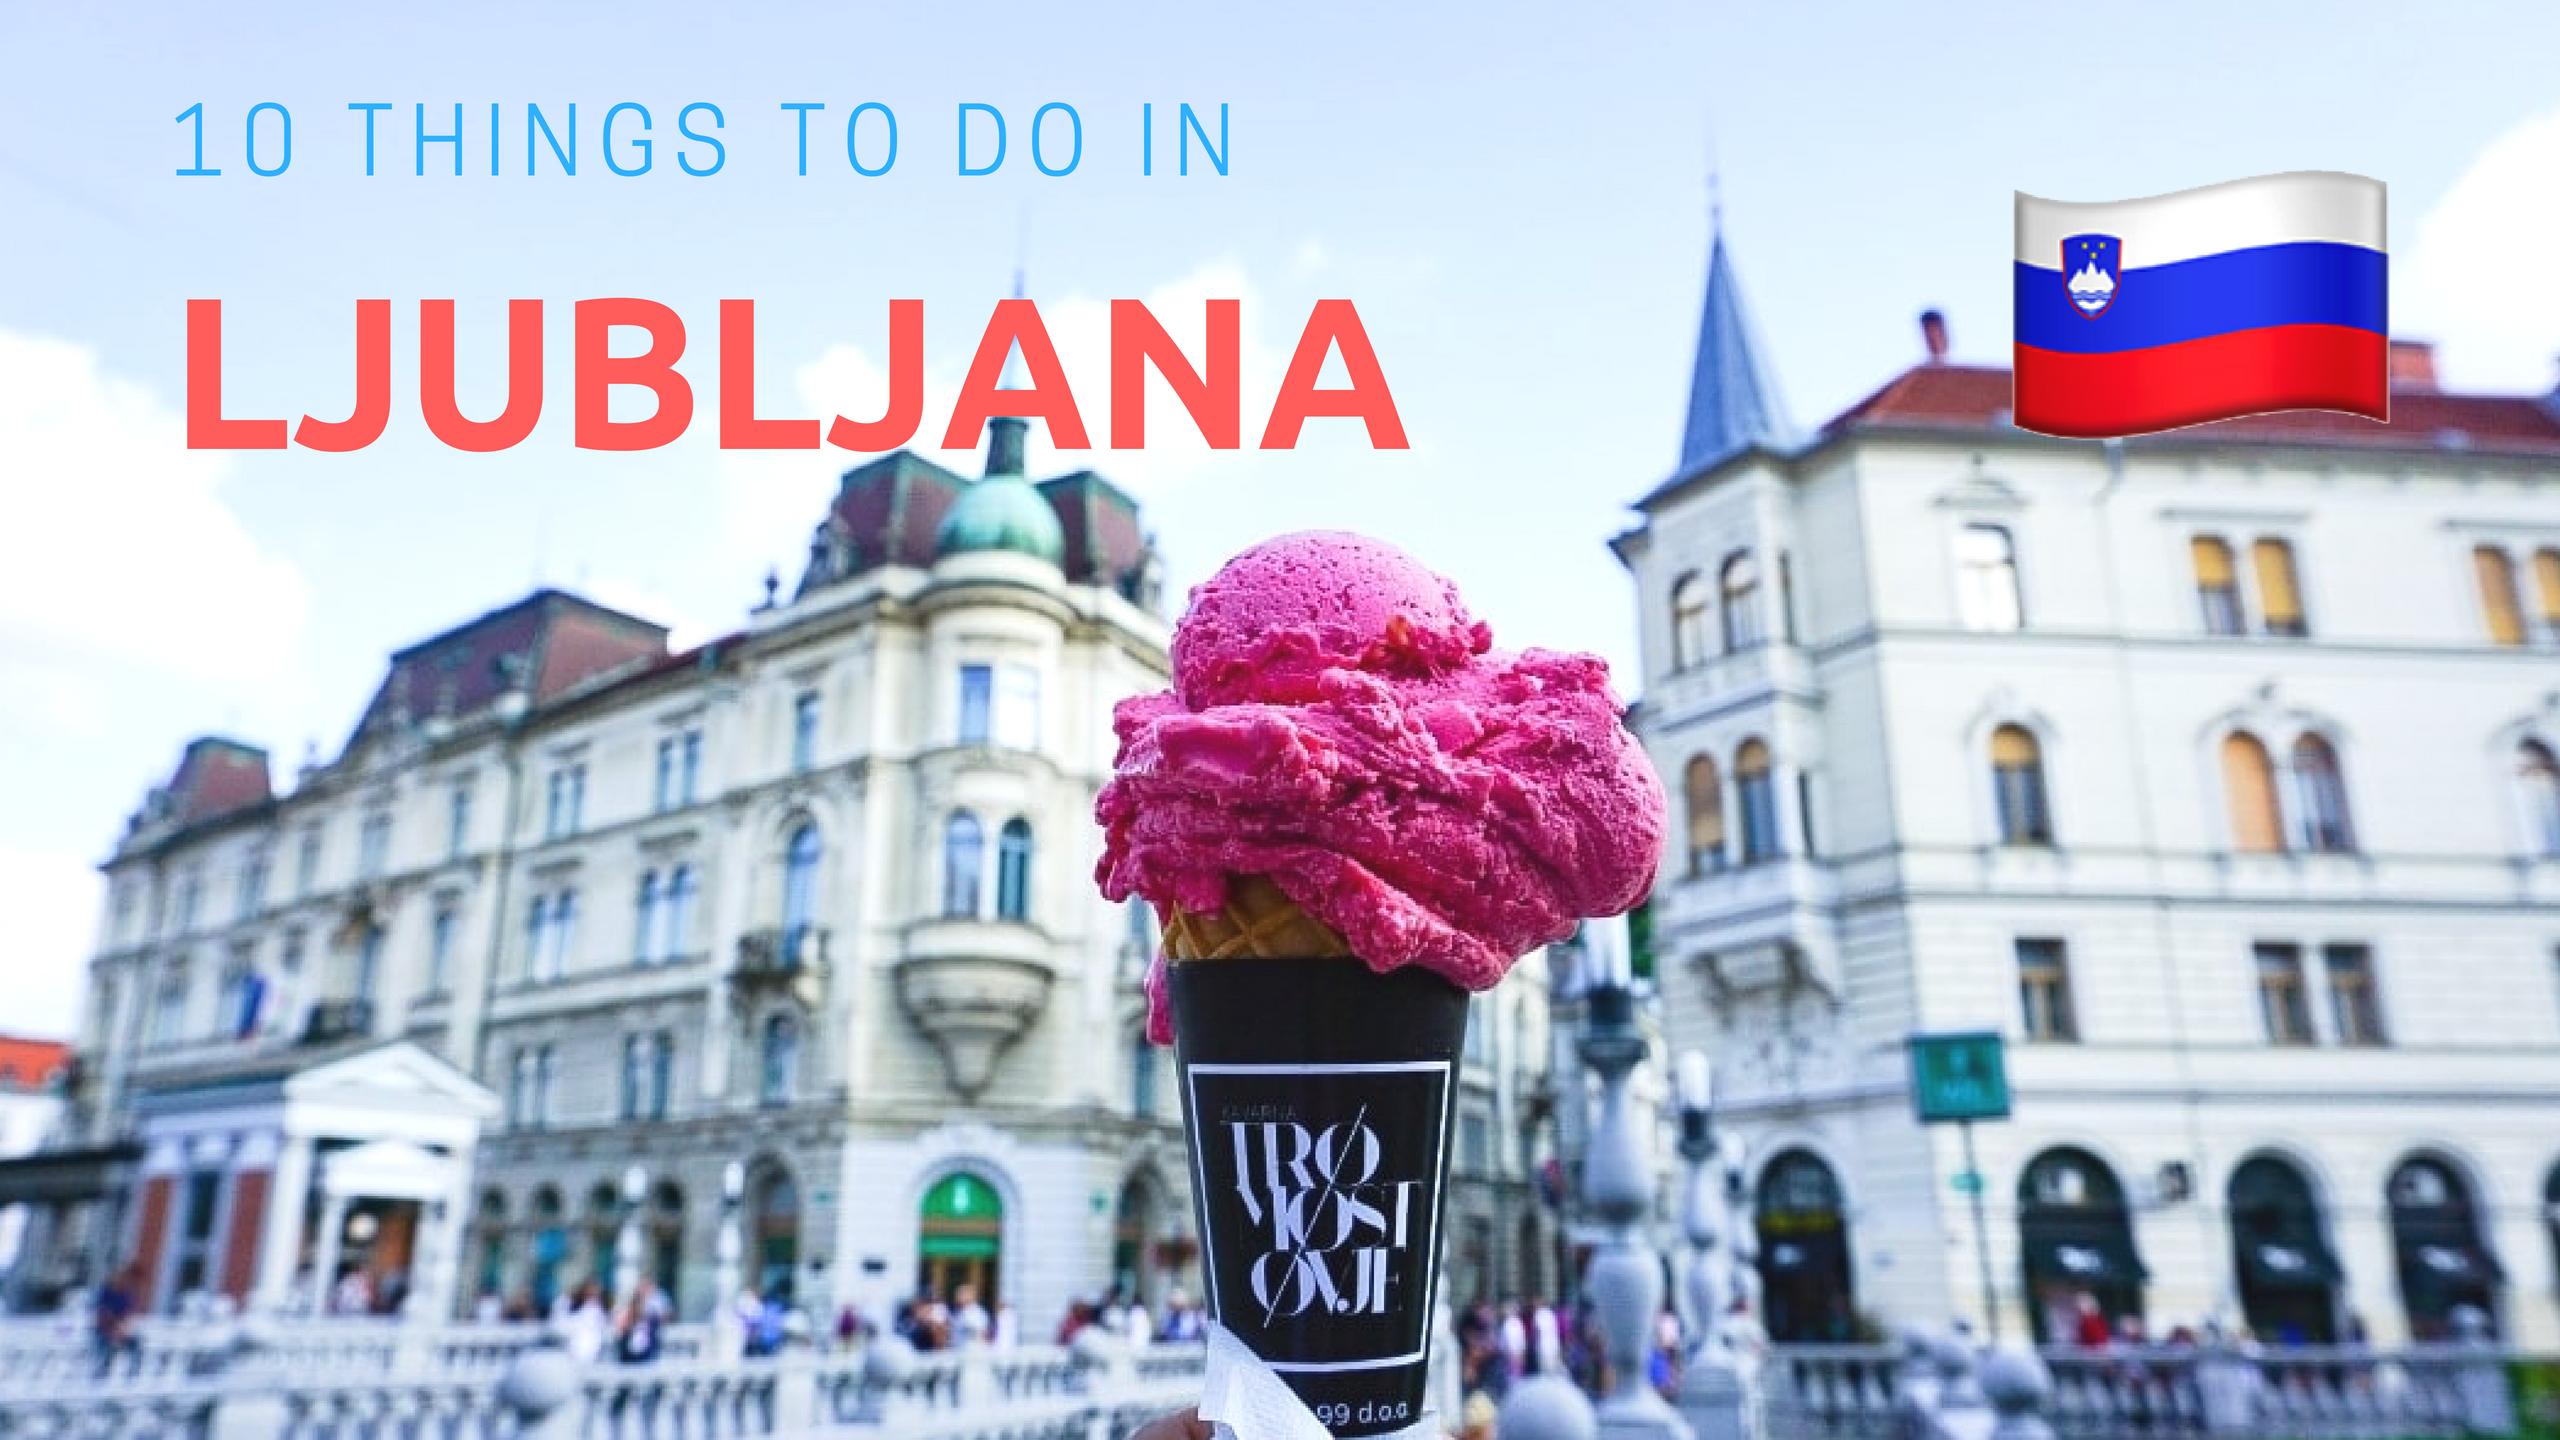 10 Things To Do In Ljubljana Slovenia